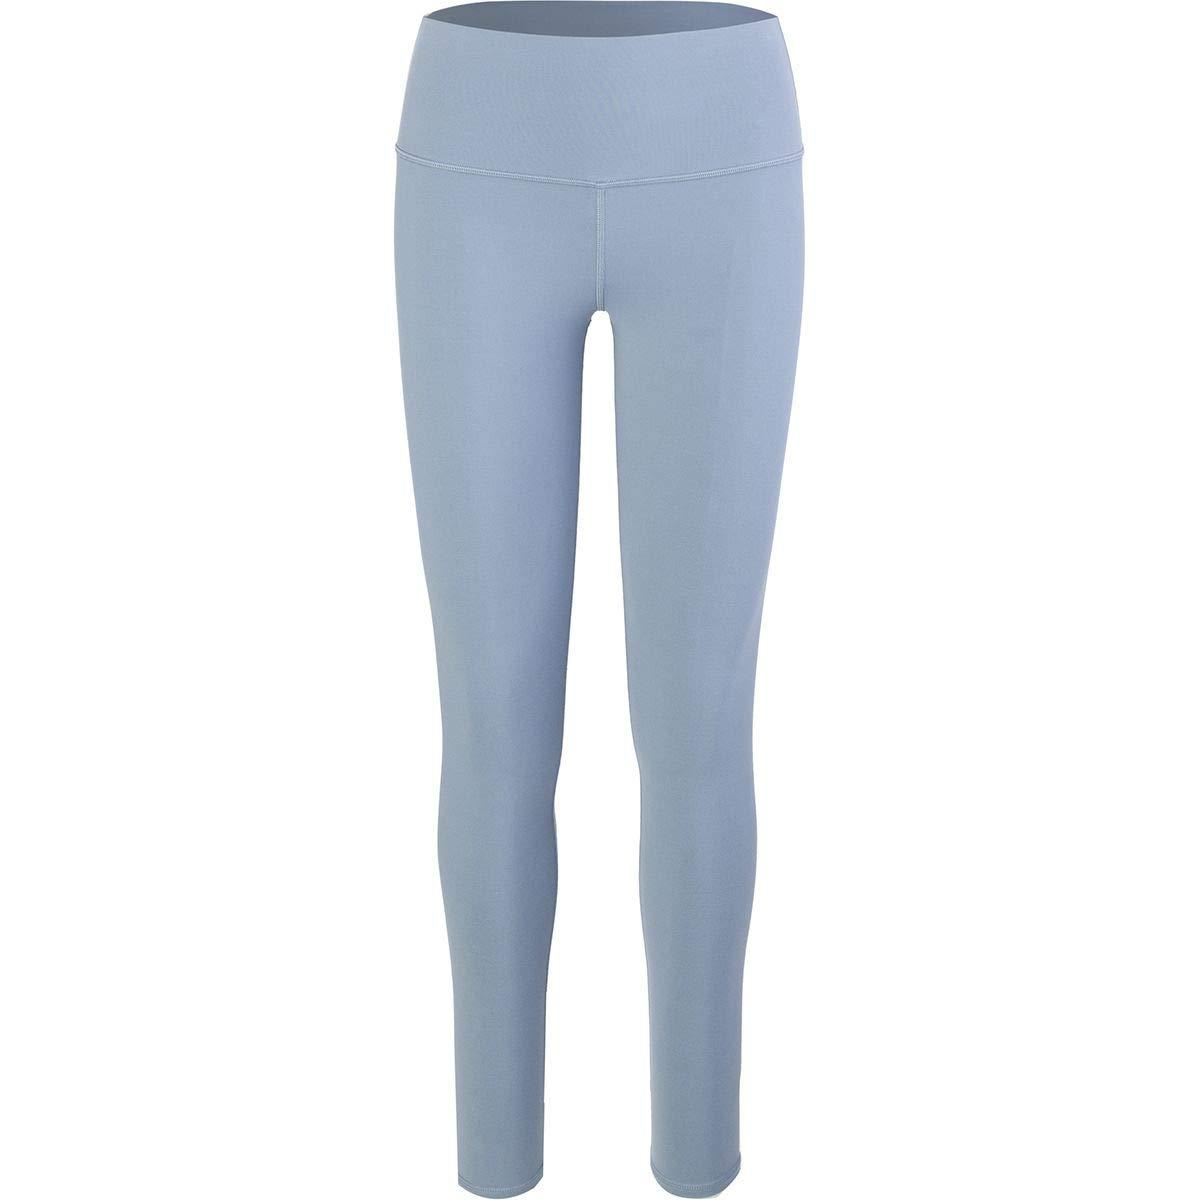 ALO Leggings de Cintura Alta para Mujer - Azul - Large ...